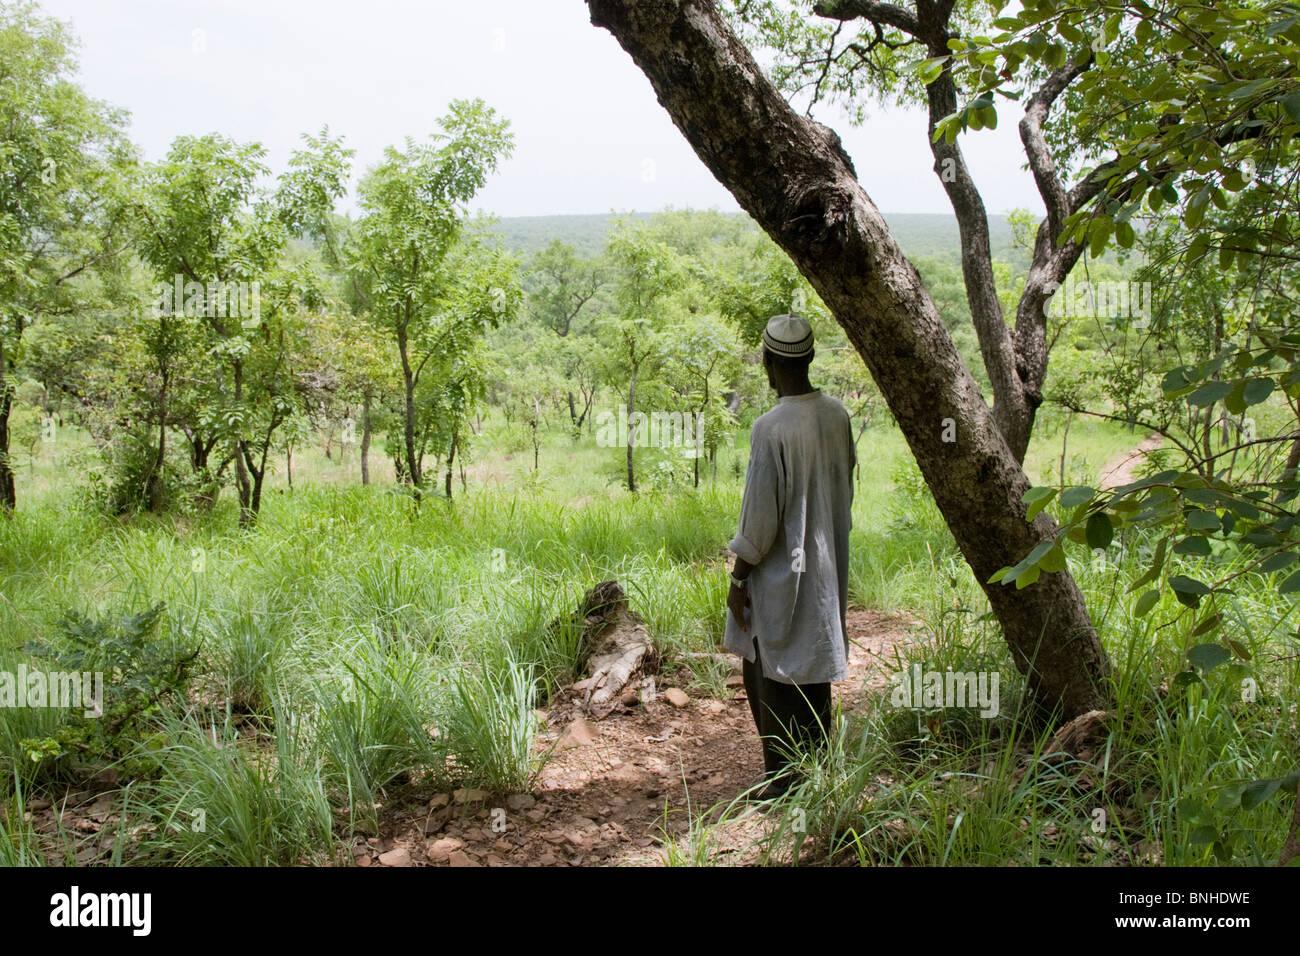 Hunter Moussa at the edge of the Nyankamba Escarpment, reached from Sor 2, Ghana. - Stock Image